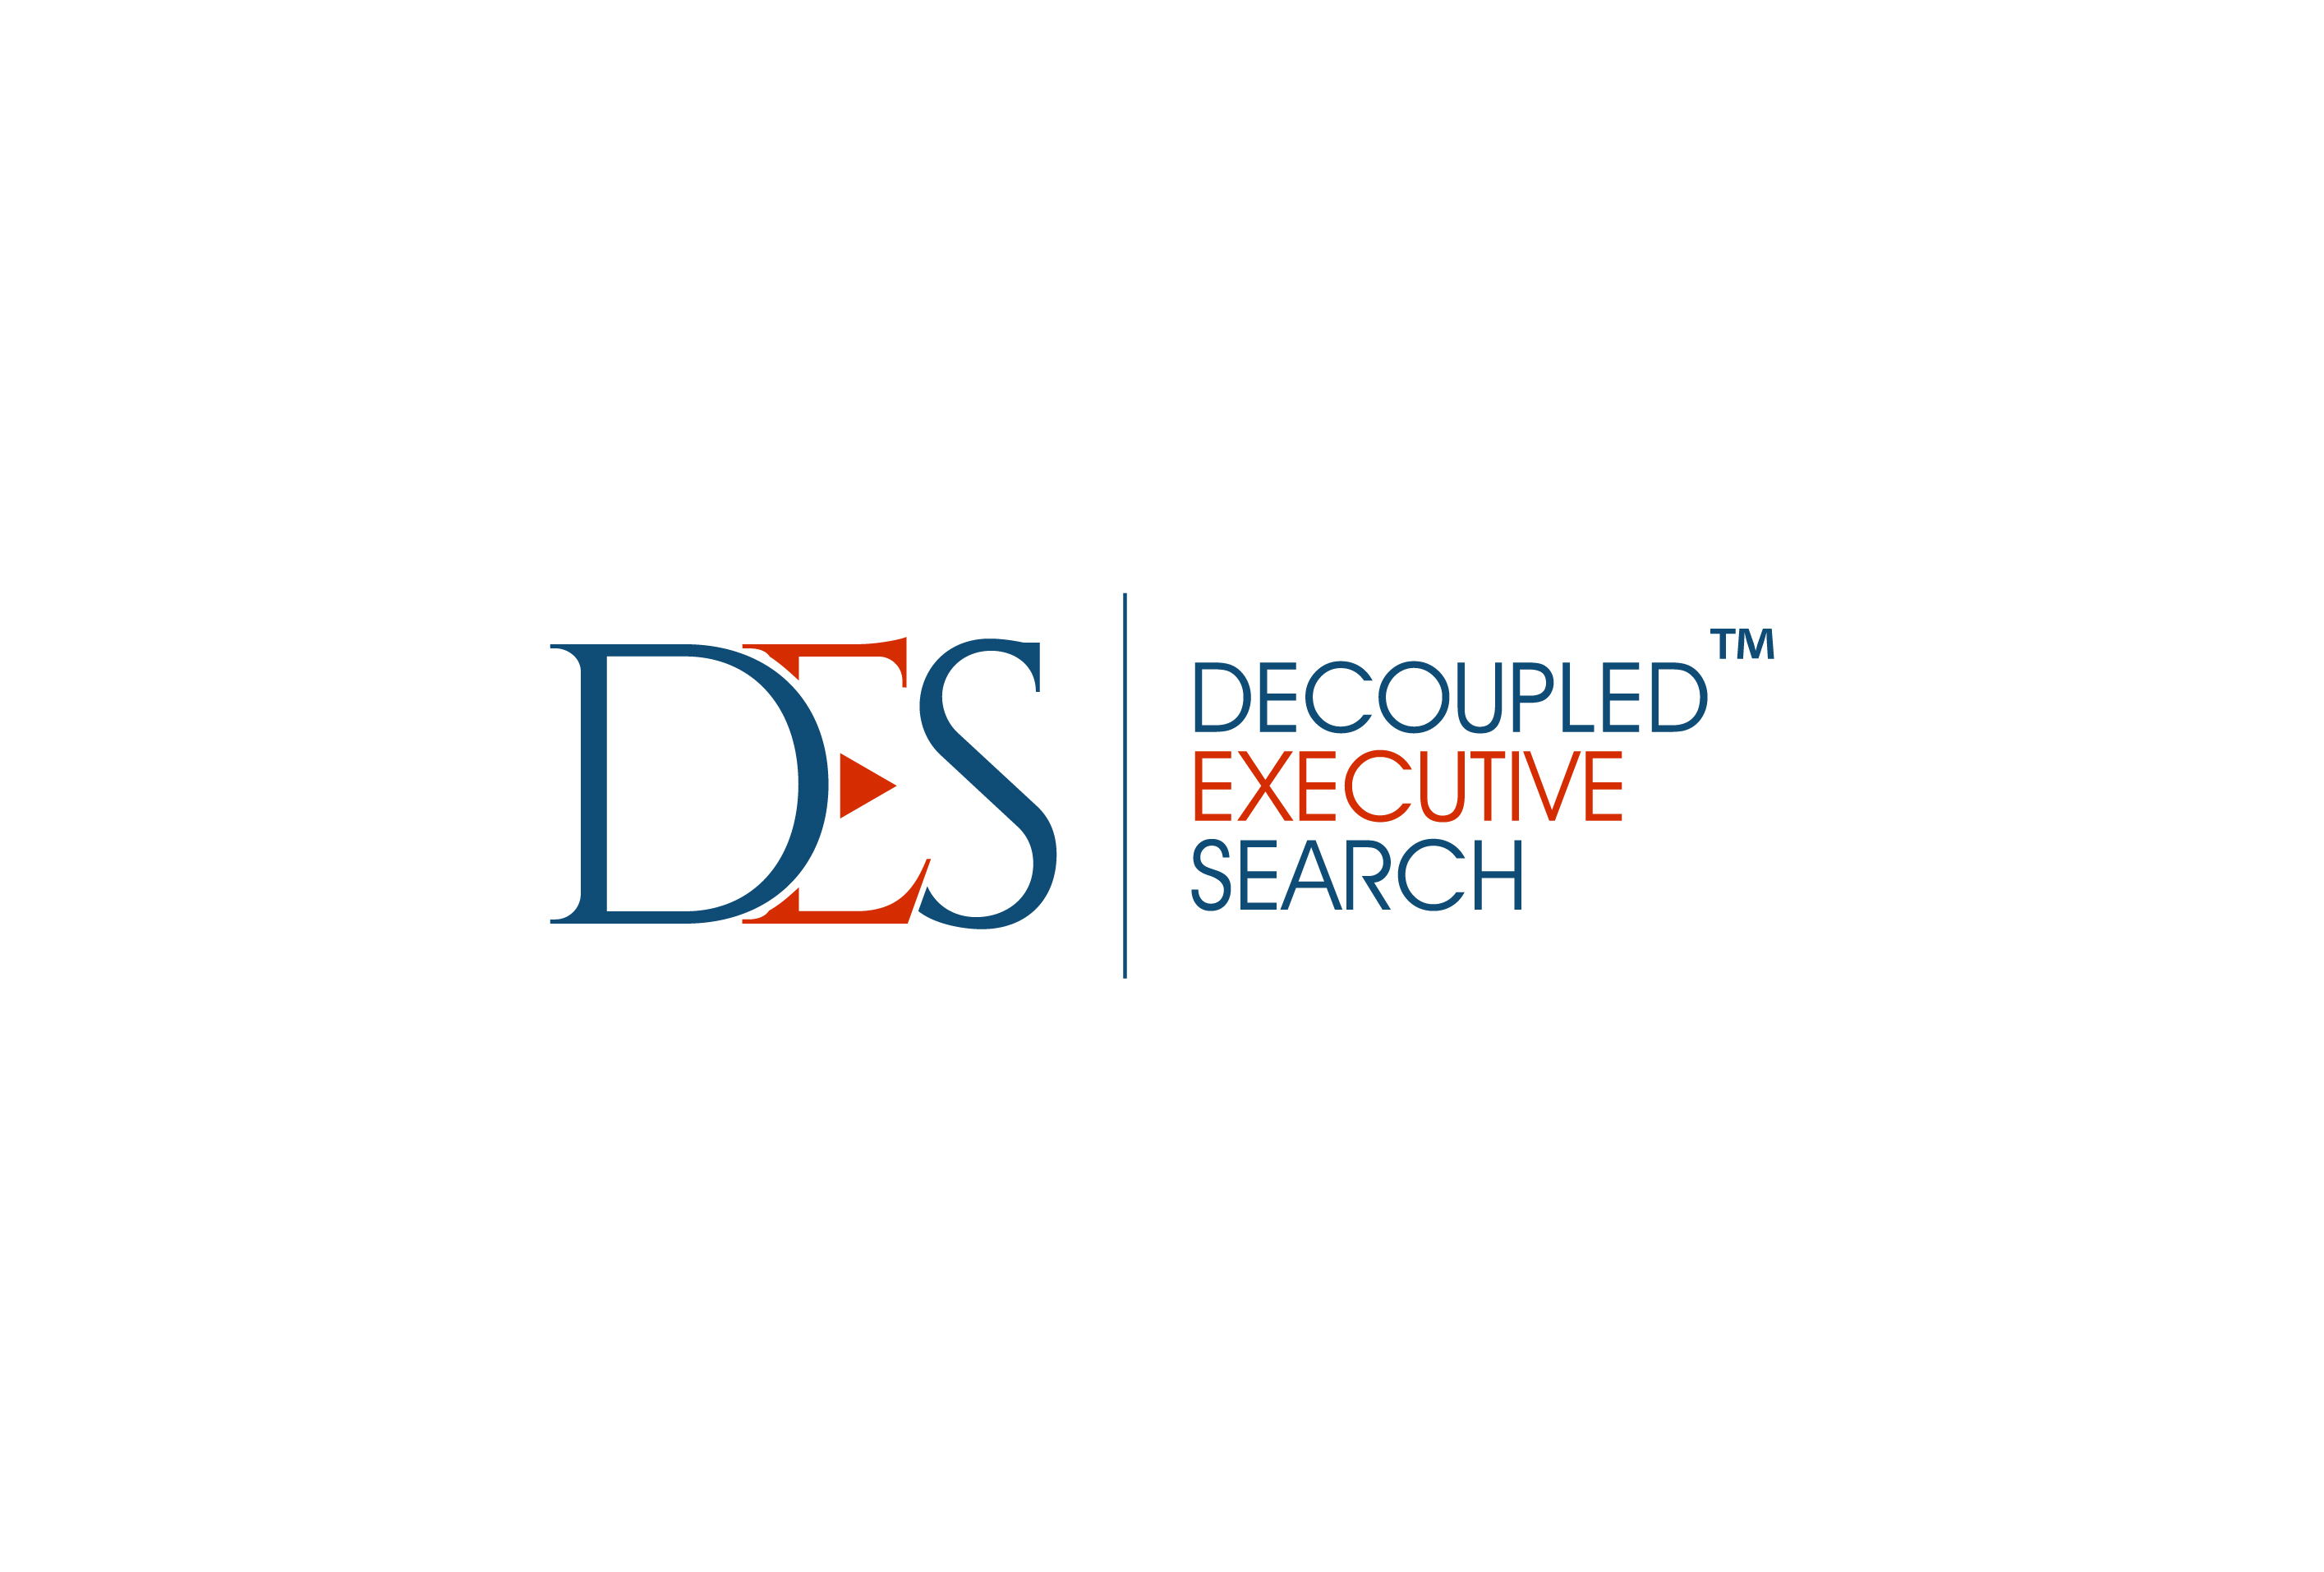 Patrick executive search